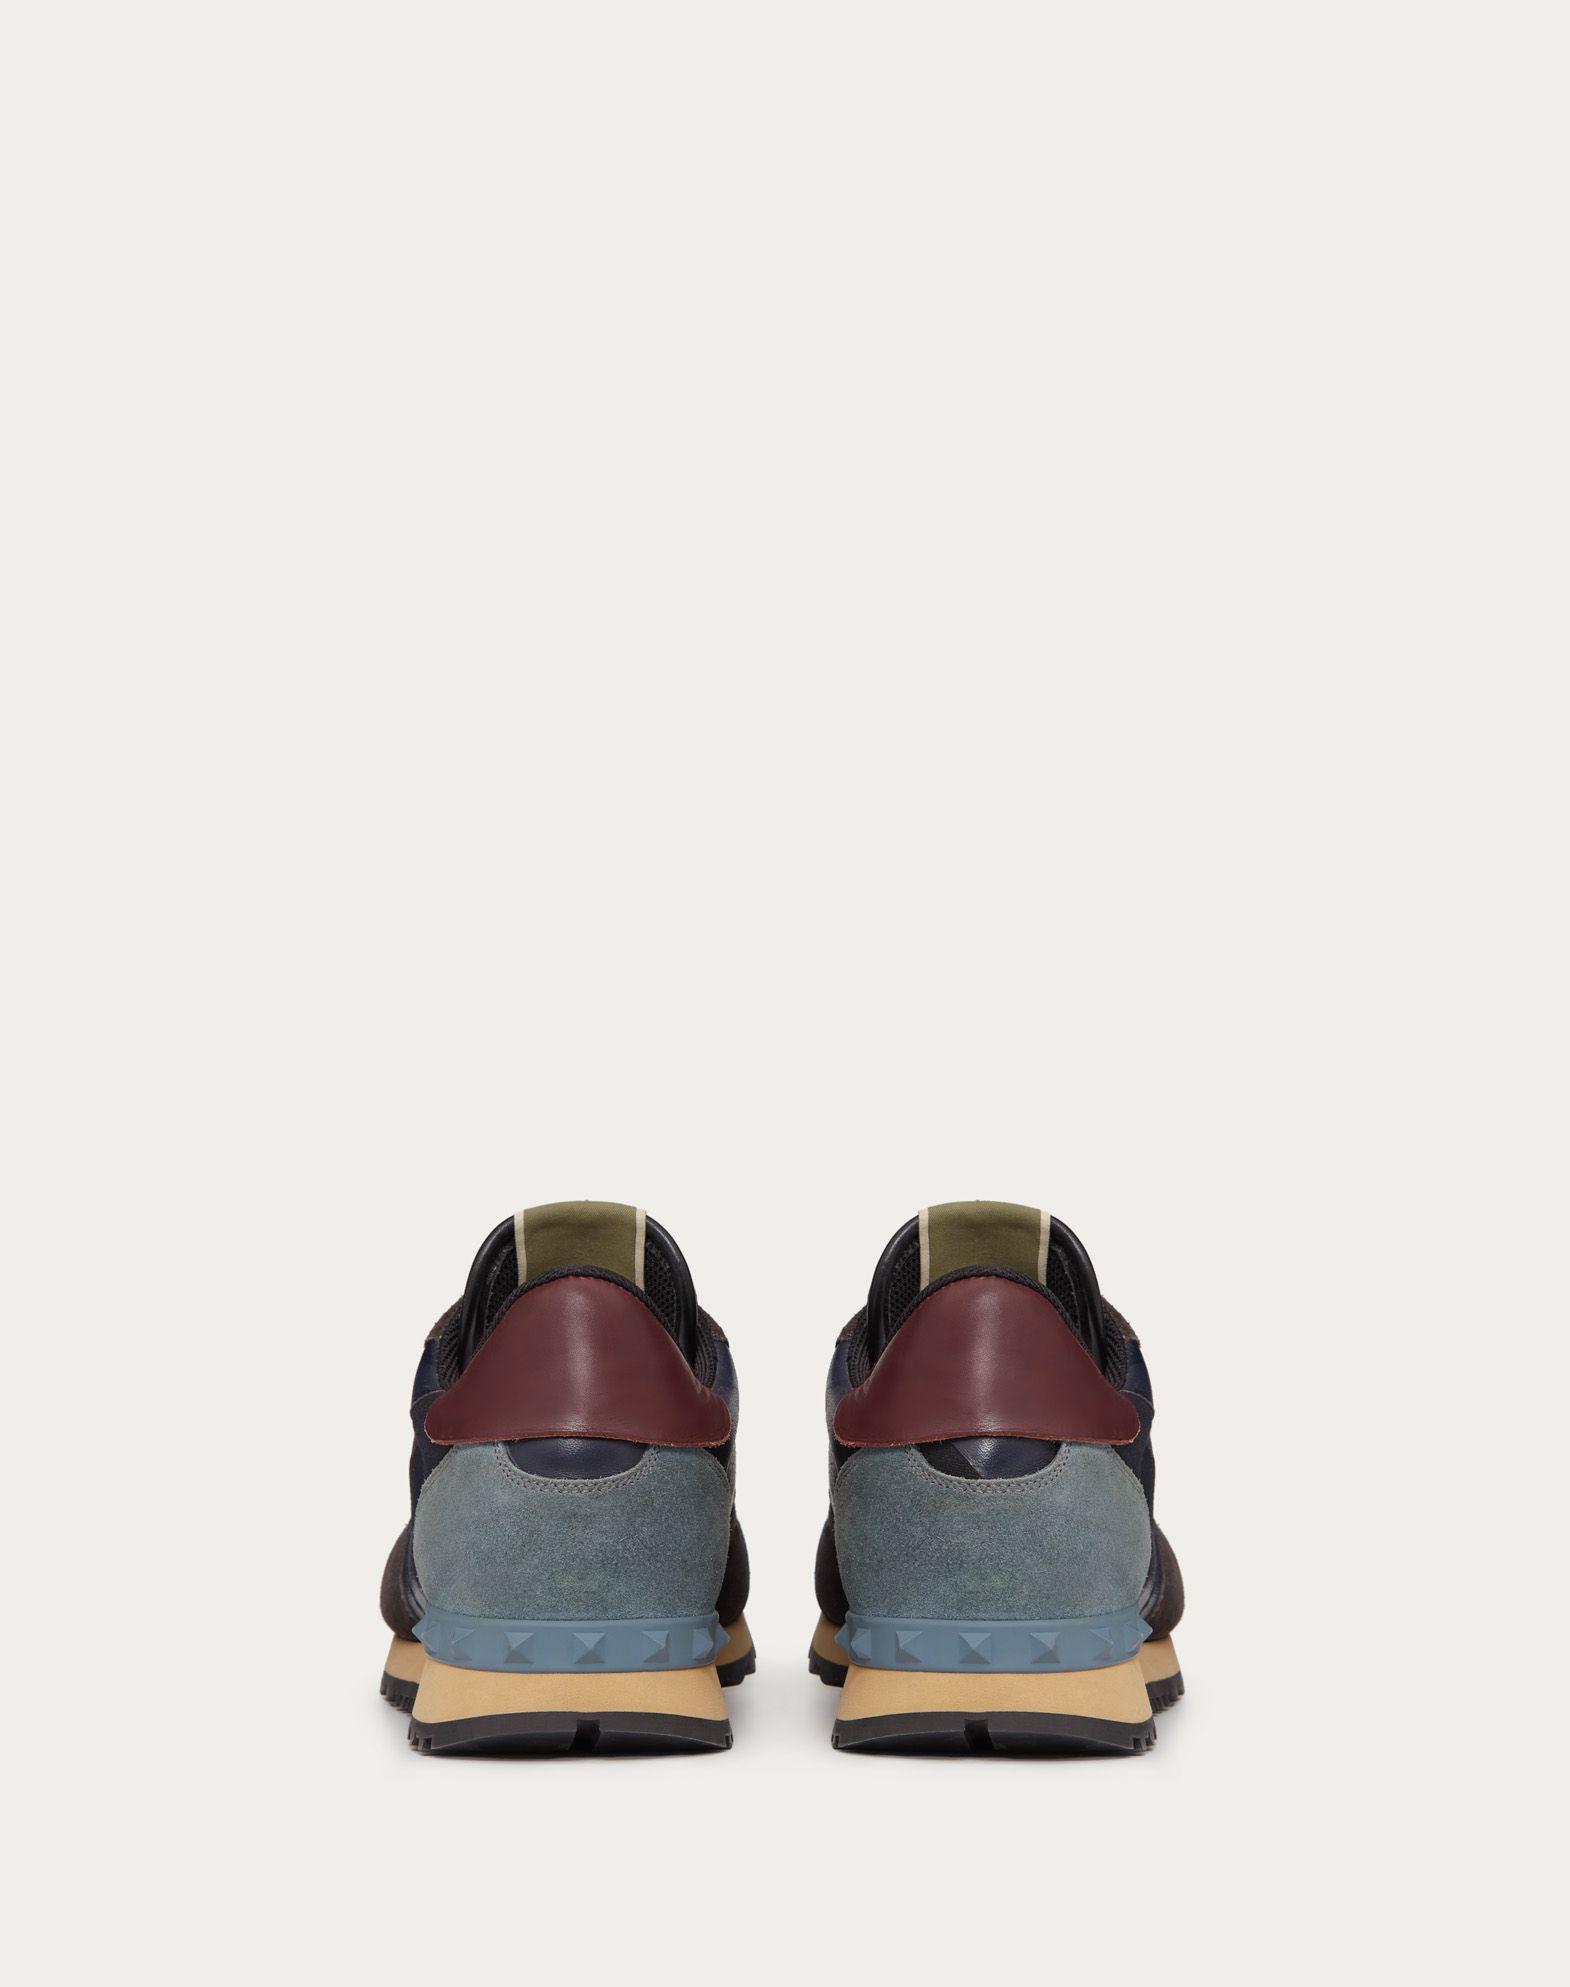 VALENTINO GARAVANI UOMO Camouflage Rockrunner Sneaker LOW-TOP SNEAKERS U d